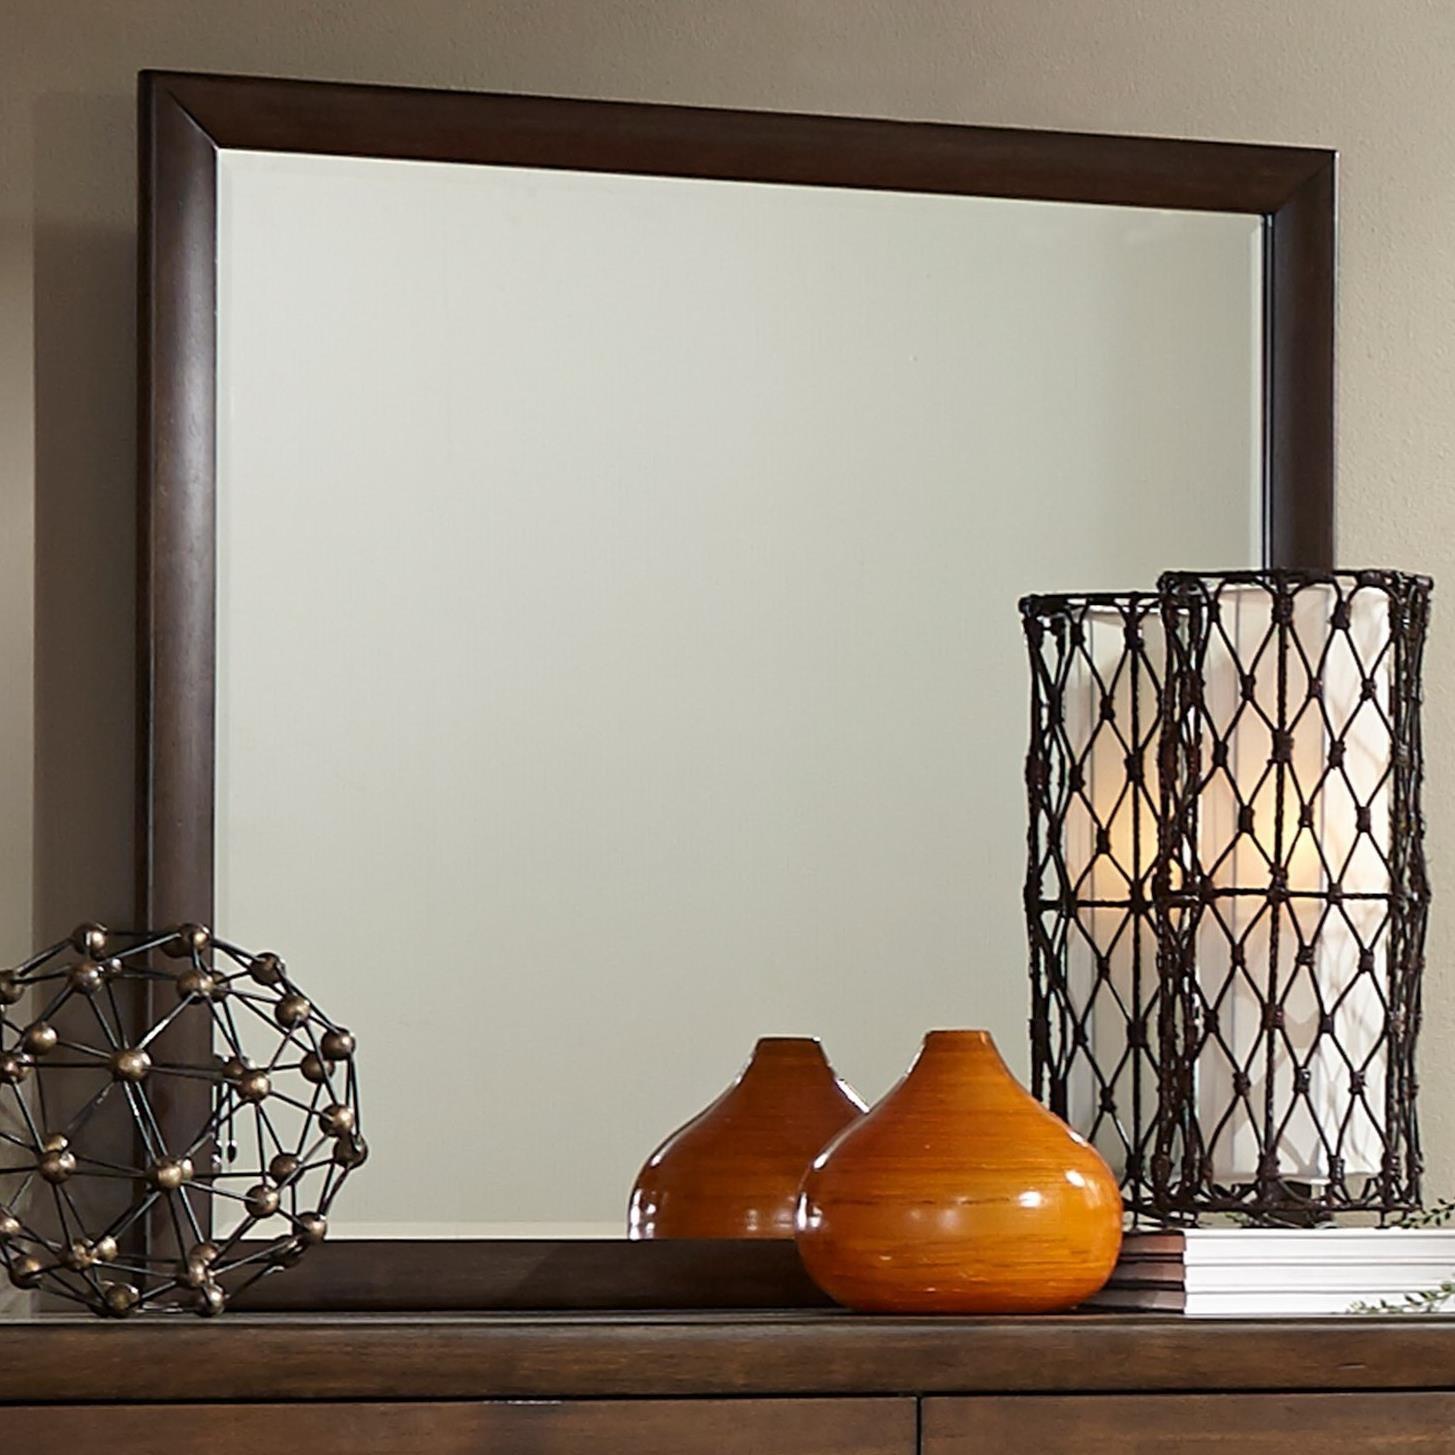 Liberty Furniture Hudson Square Bedroom Mirror - Item Number: 365-BR51